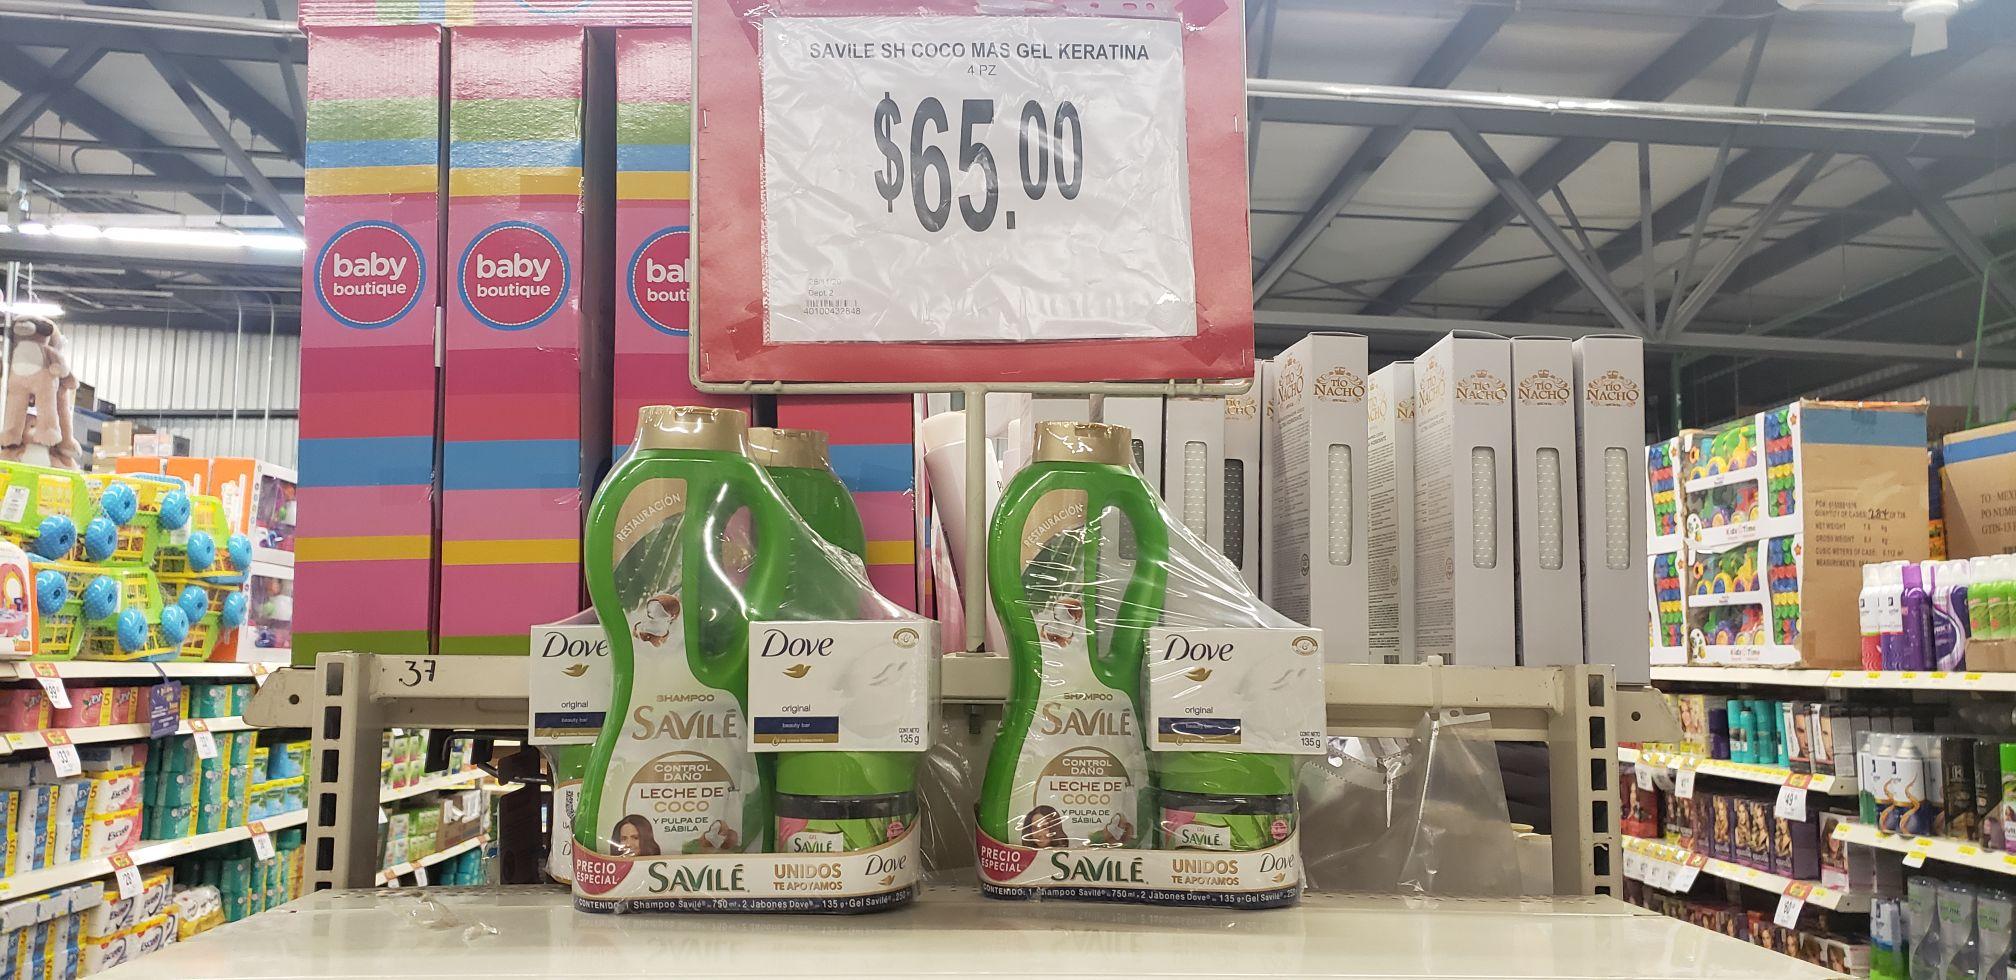 Bodega Aurrera: Paquete Shampoo+Gel+2 Jabones Dove